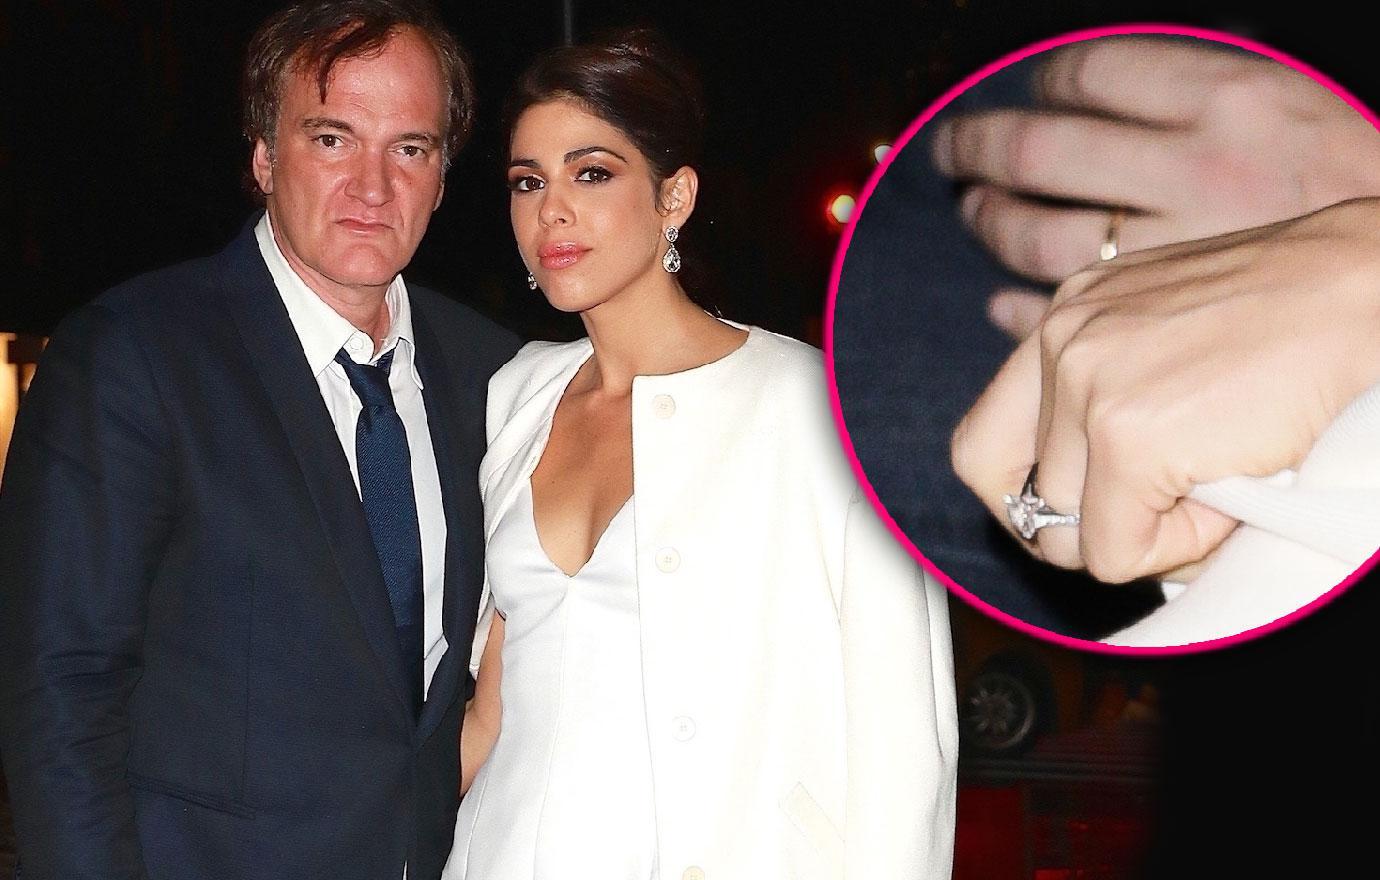 Quentin Tarantino Daniela Pick Engagement Dinner Uma Thurman Bruce Willis